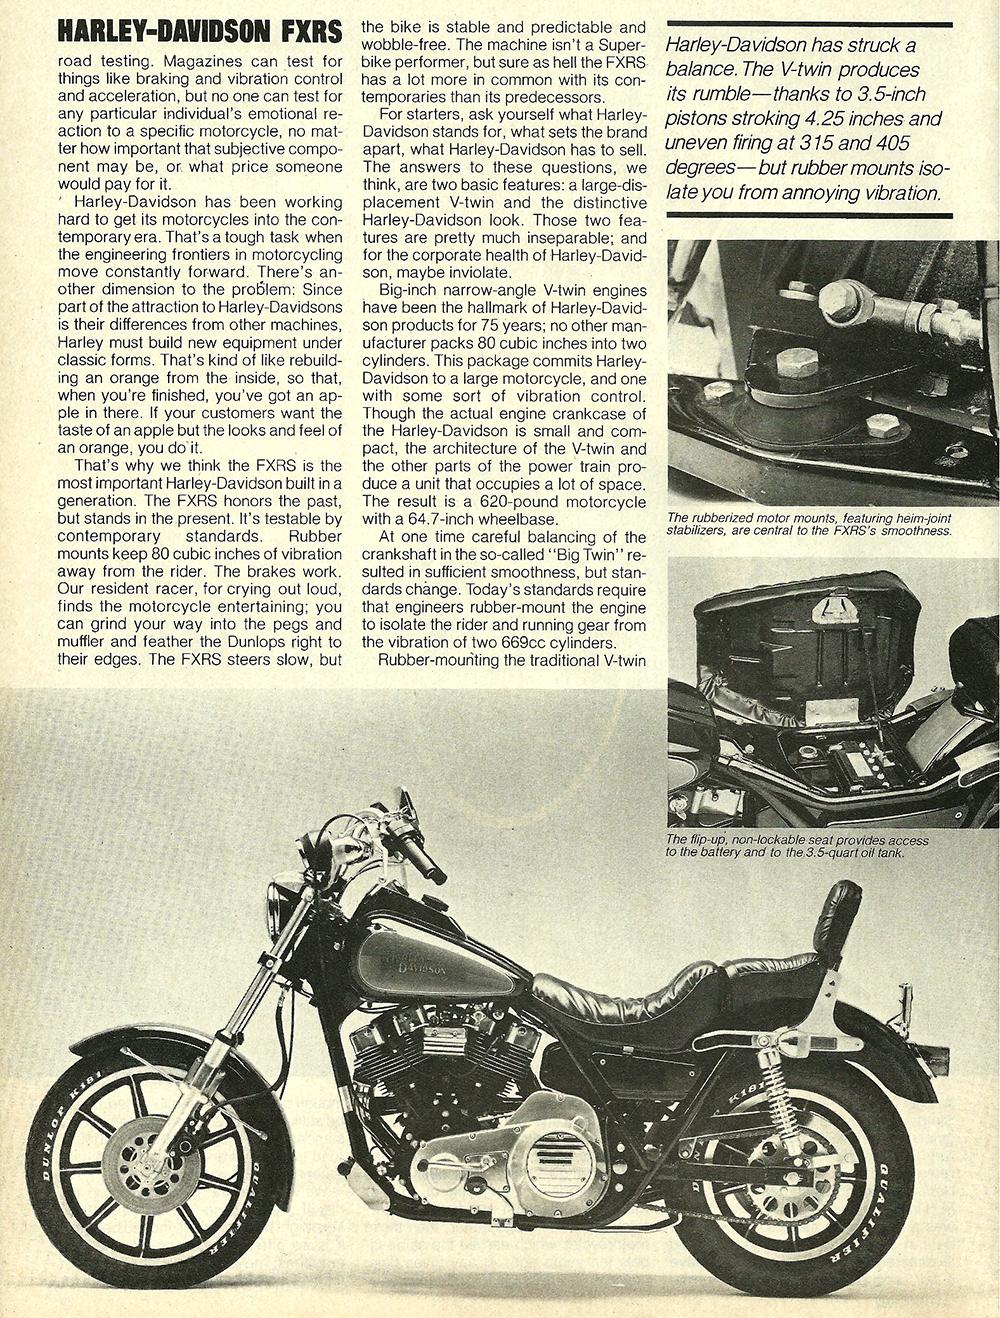 1982 Harley-Davidson FXRS road test 03.jpg